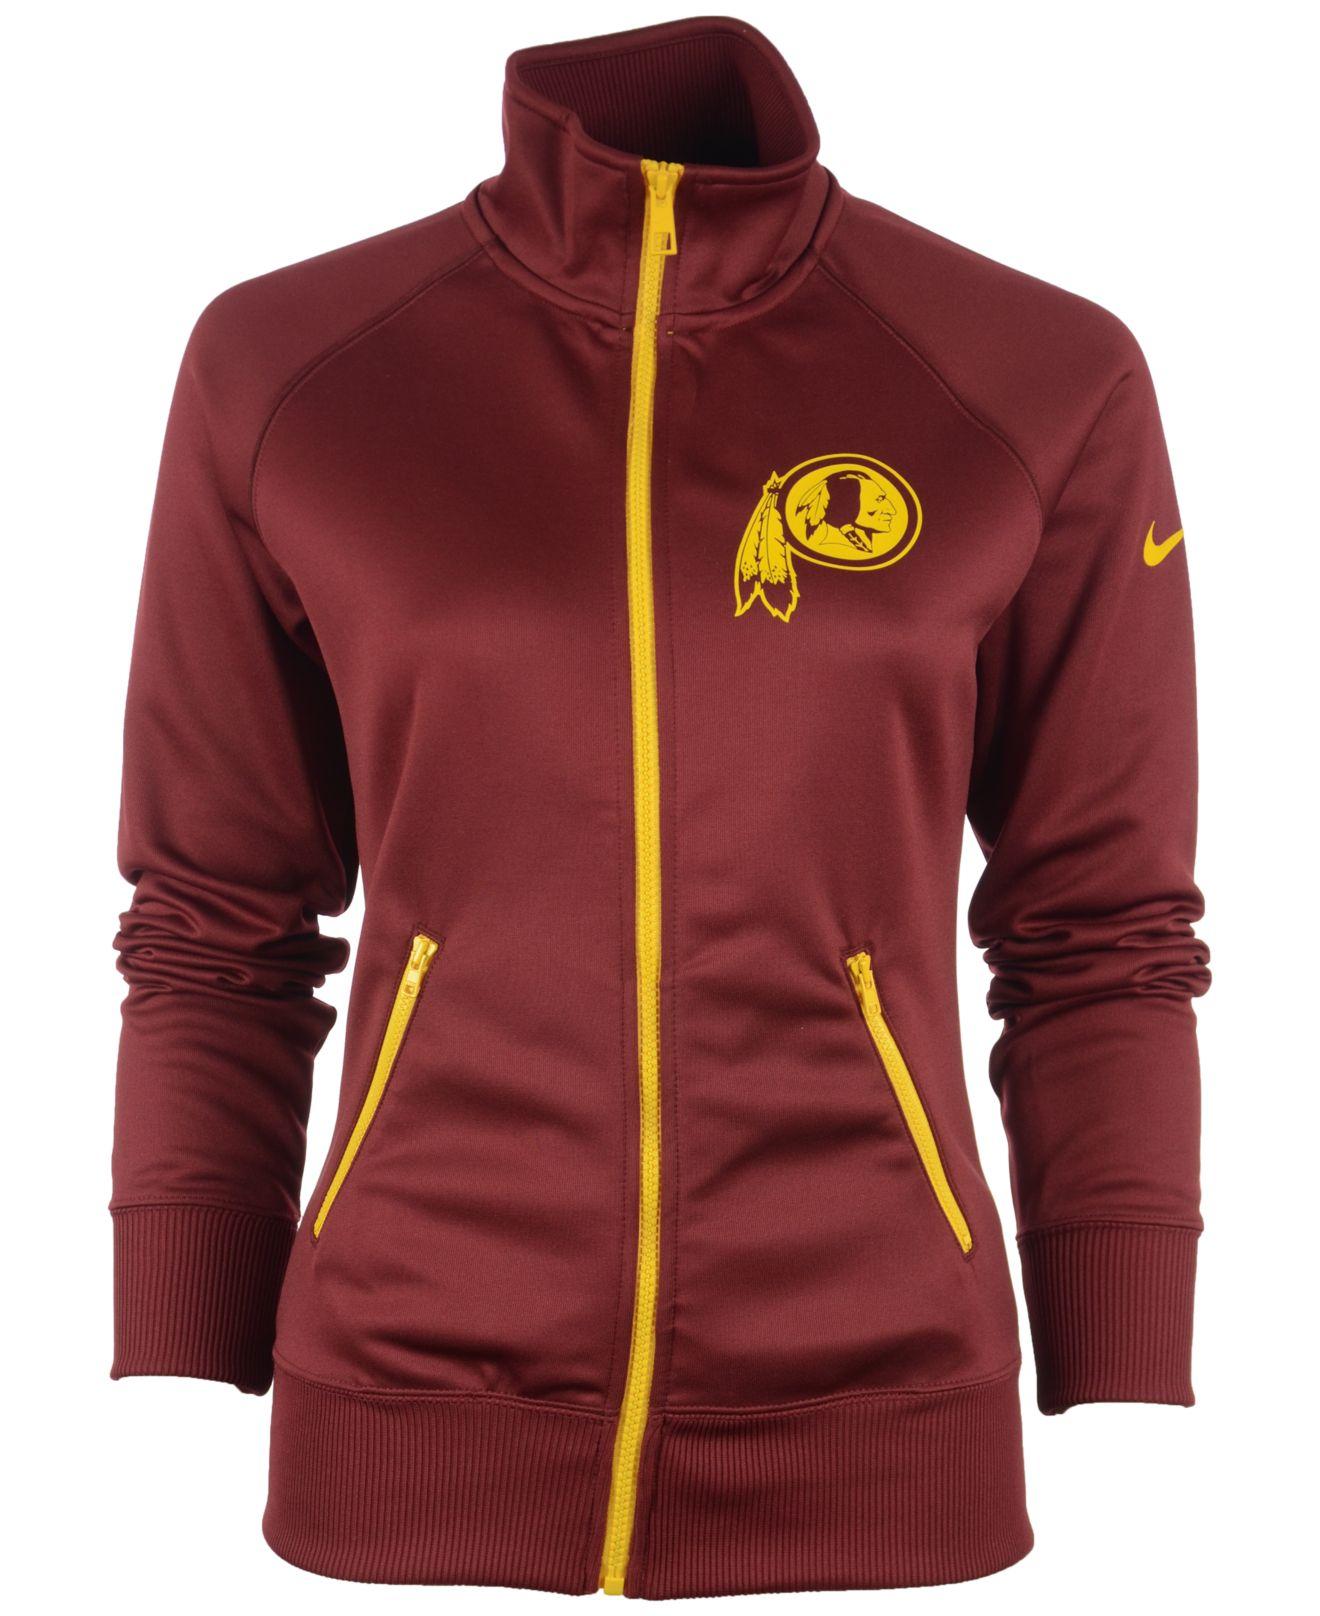 78b14a58 Nike Women's Washington Redskins Mvp Track Jacket for men